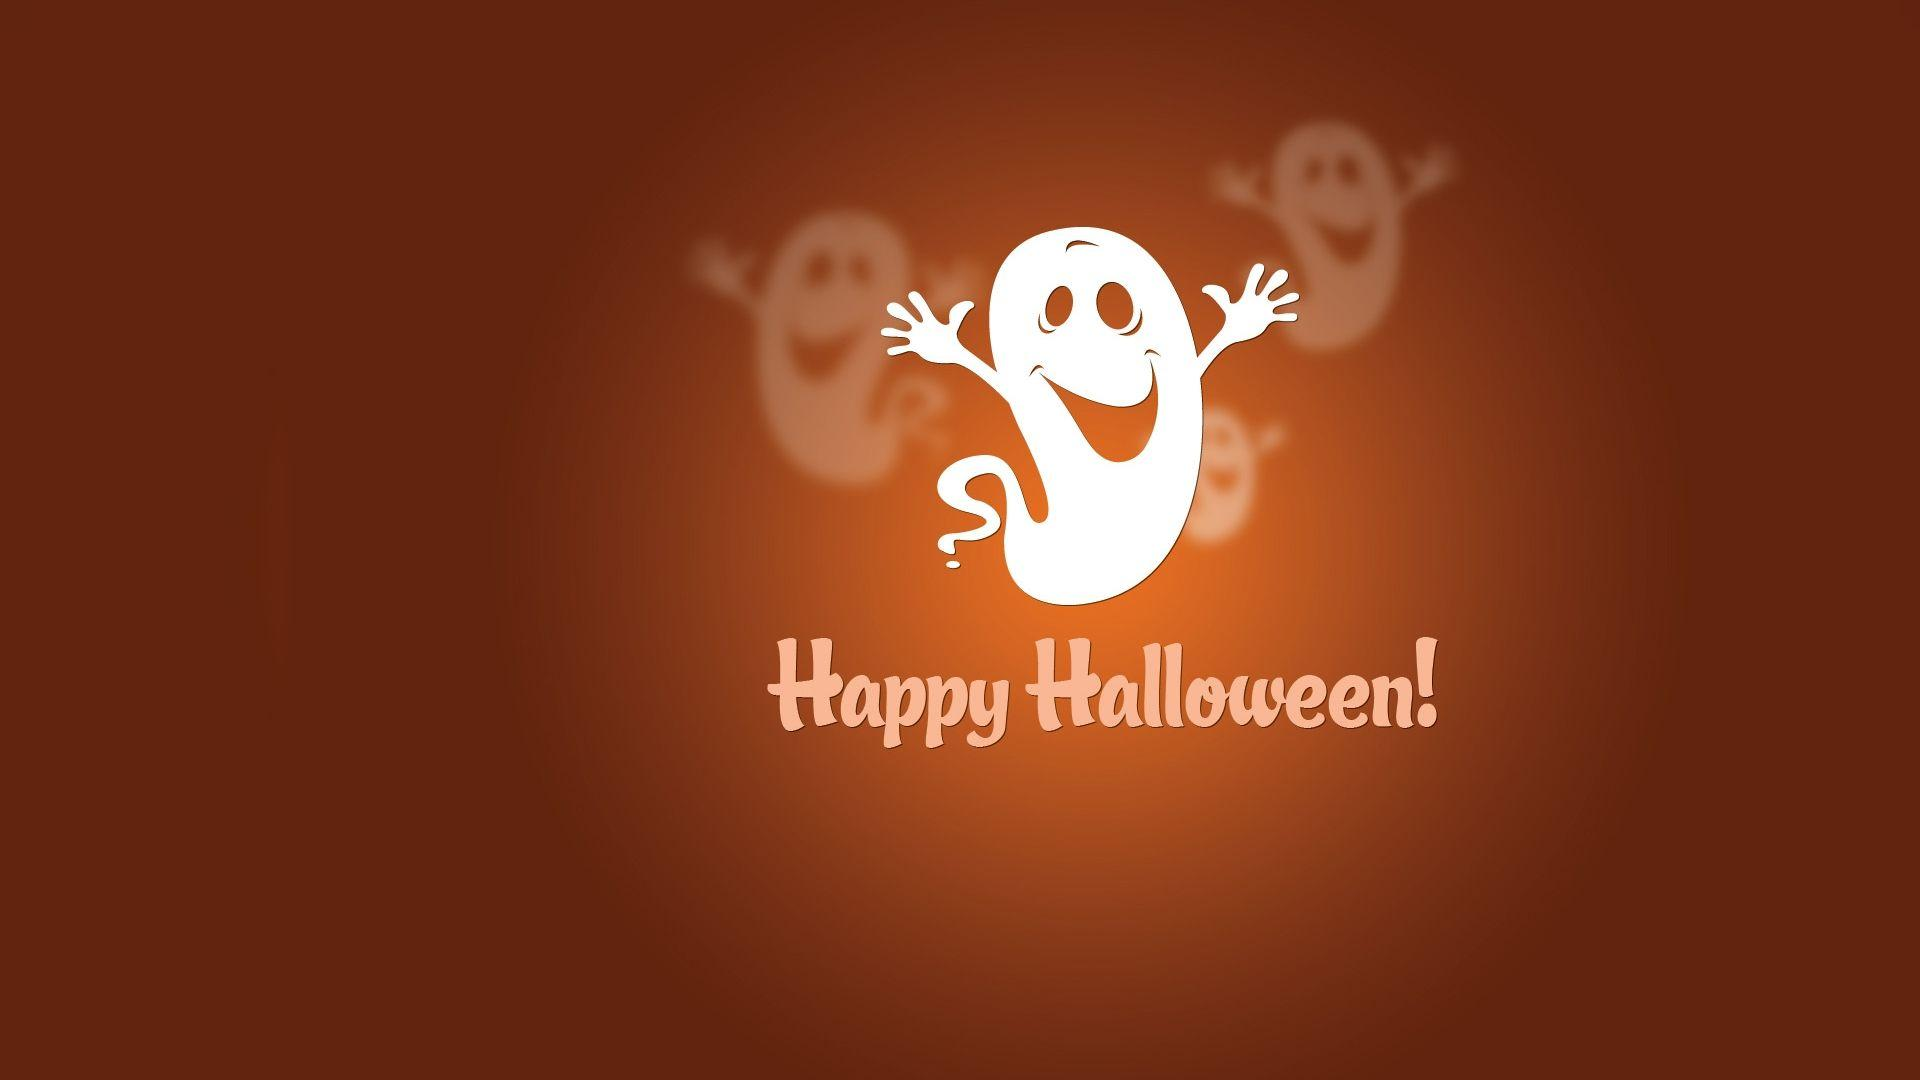 Cute Halloween Desktop Backgrounds 1920x1080